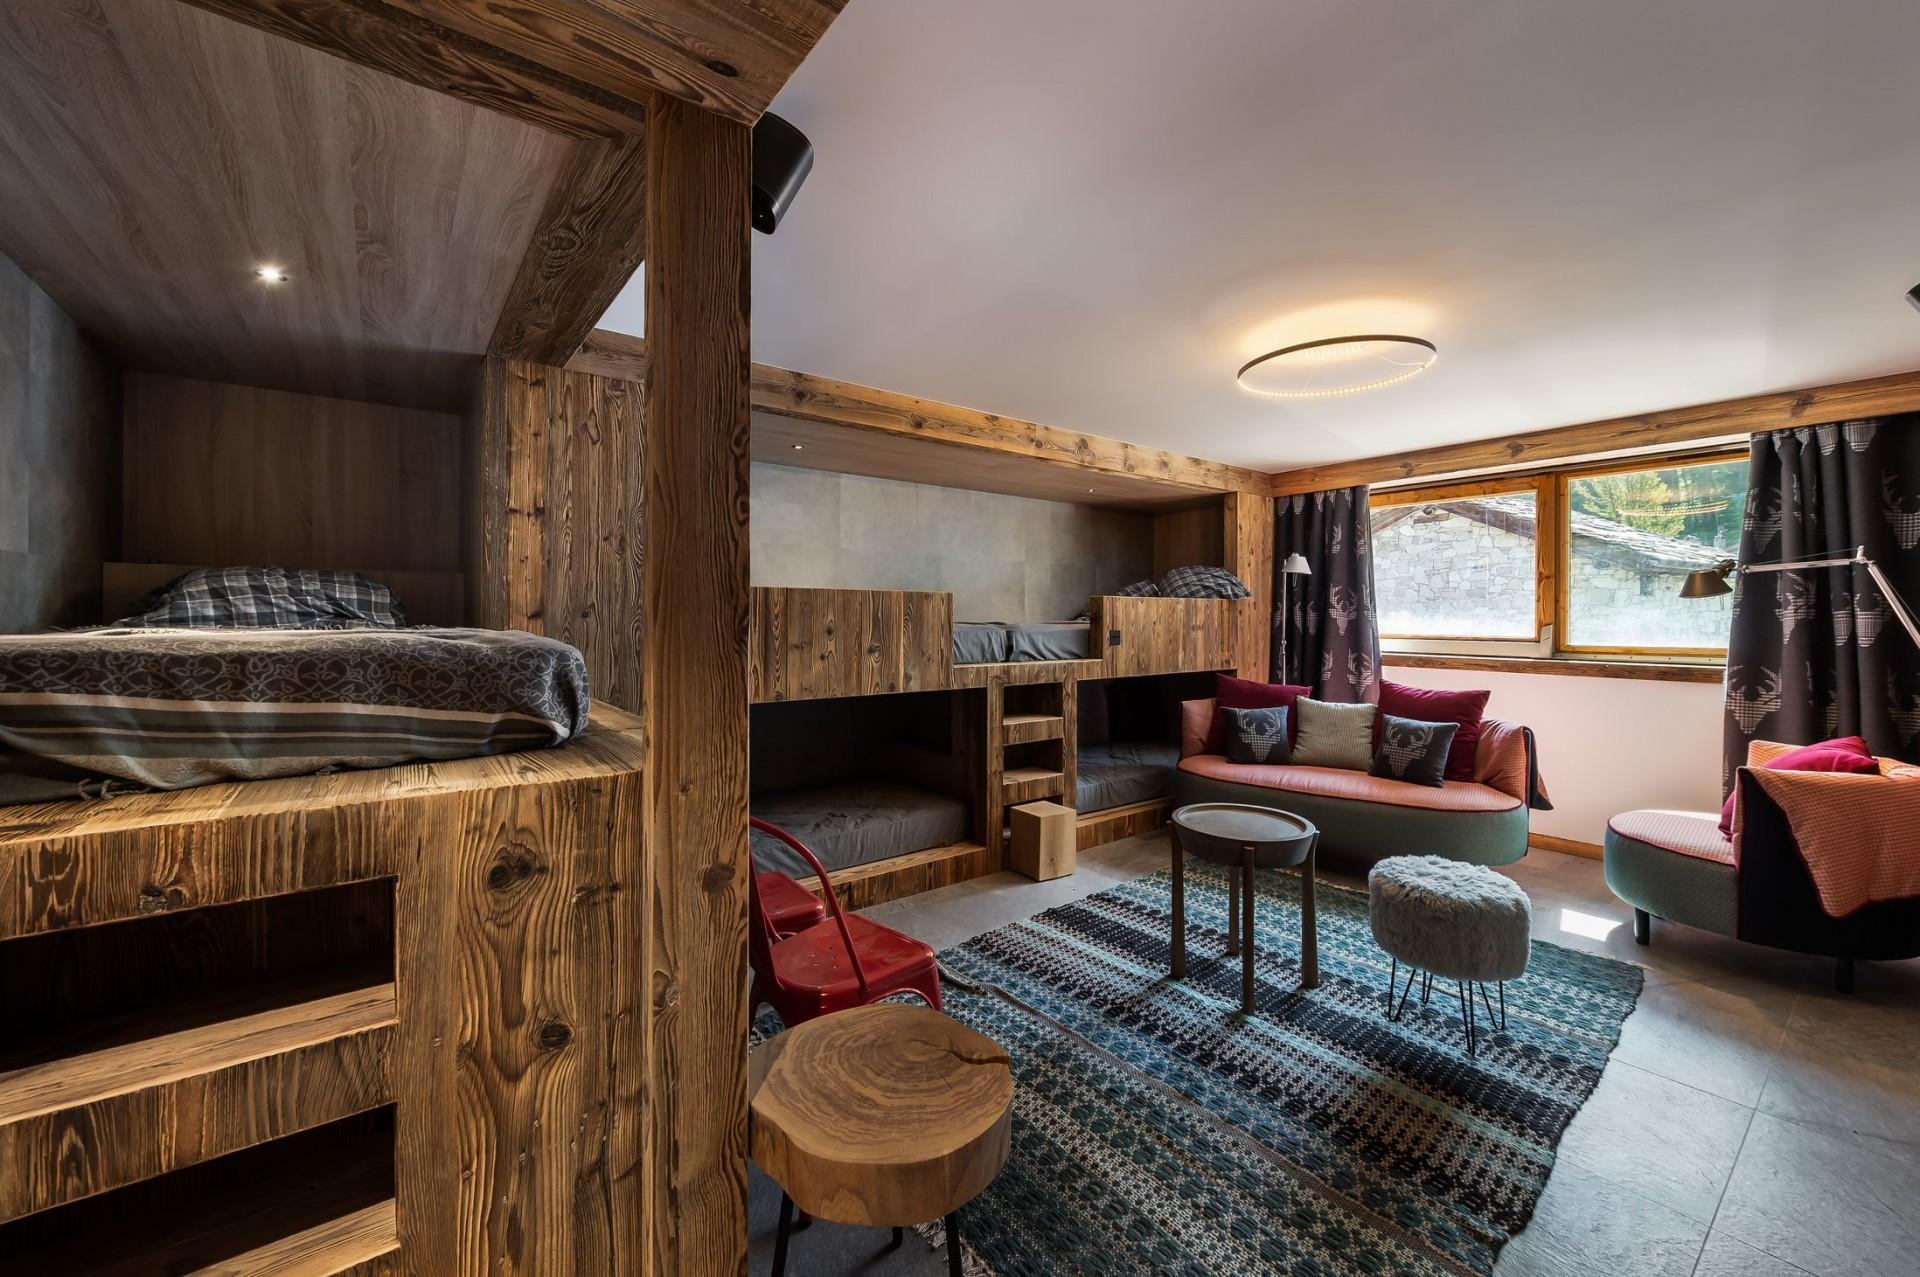 Val d'Isère Location Chalet Luxe Tellanche Chambre 4